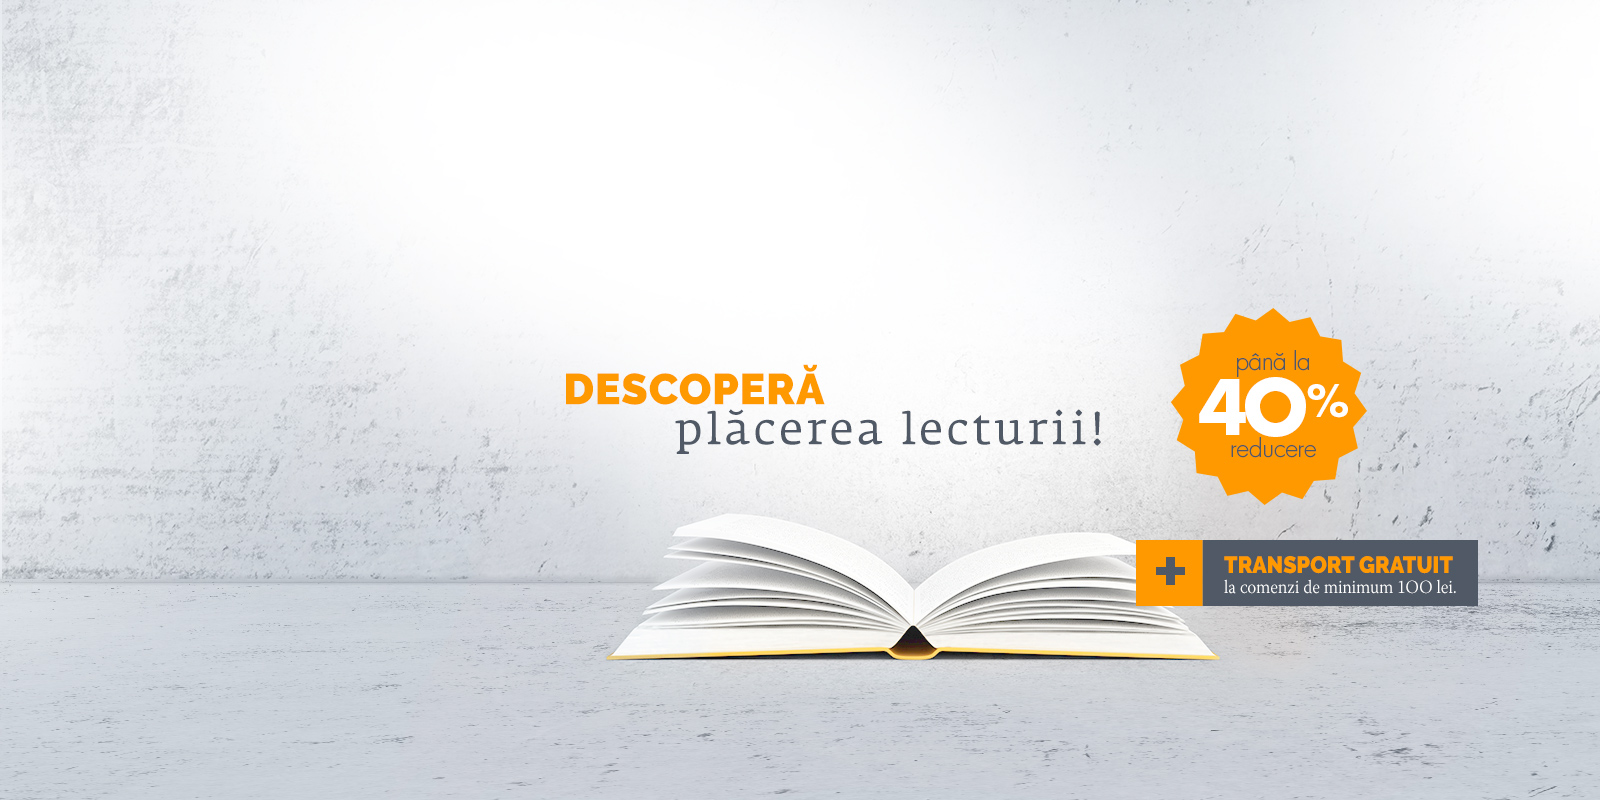 Descopera placerea lecturii